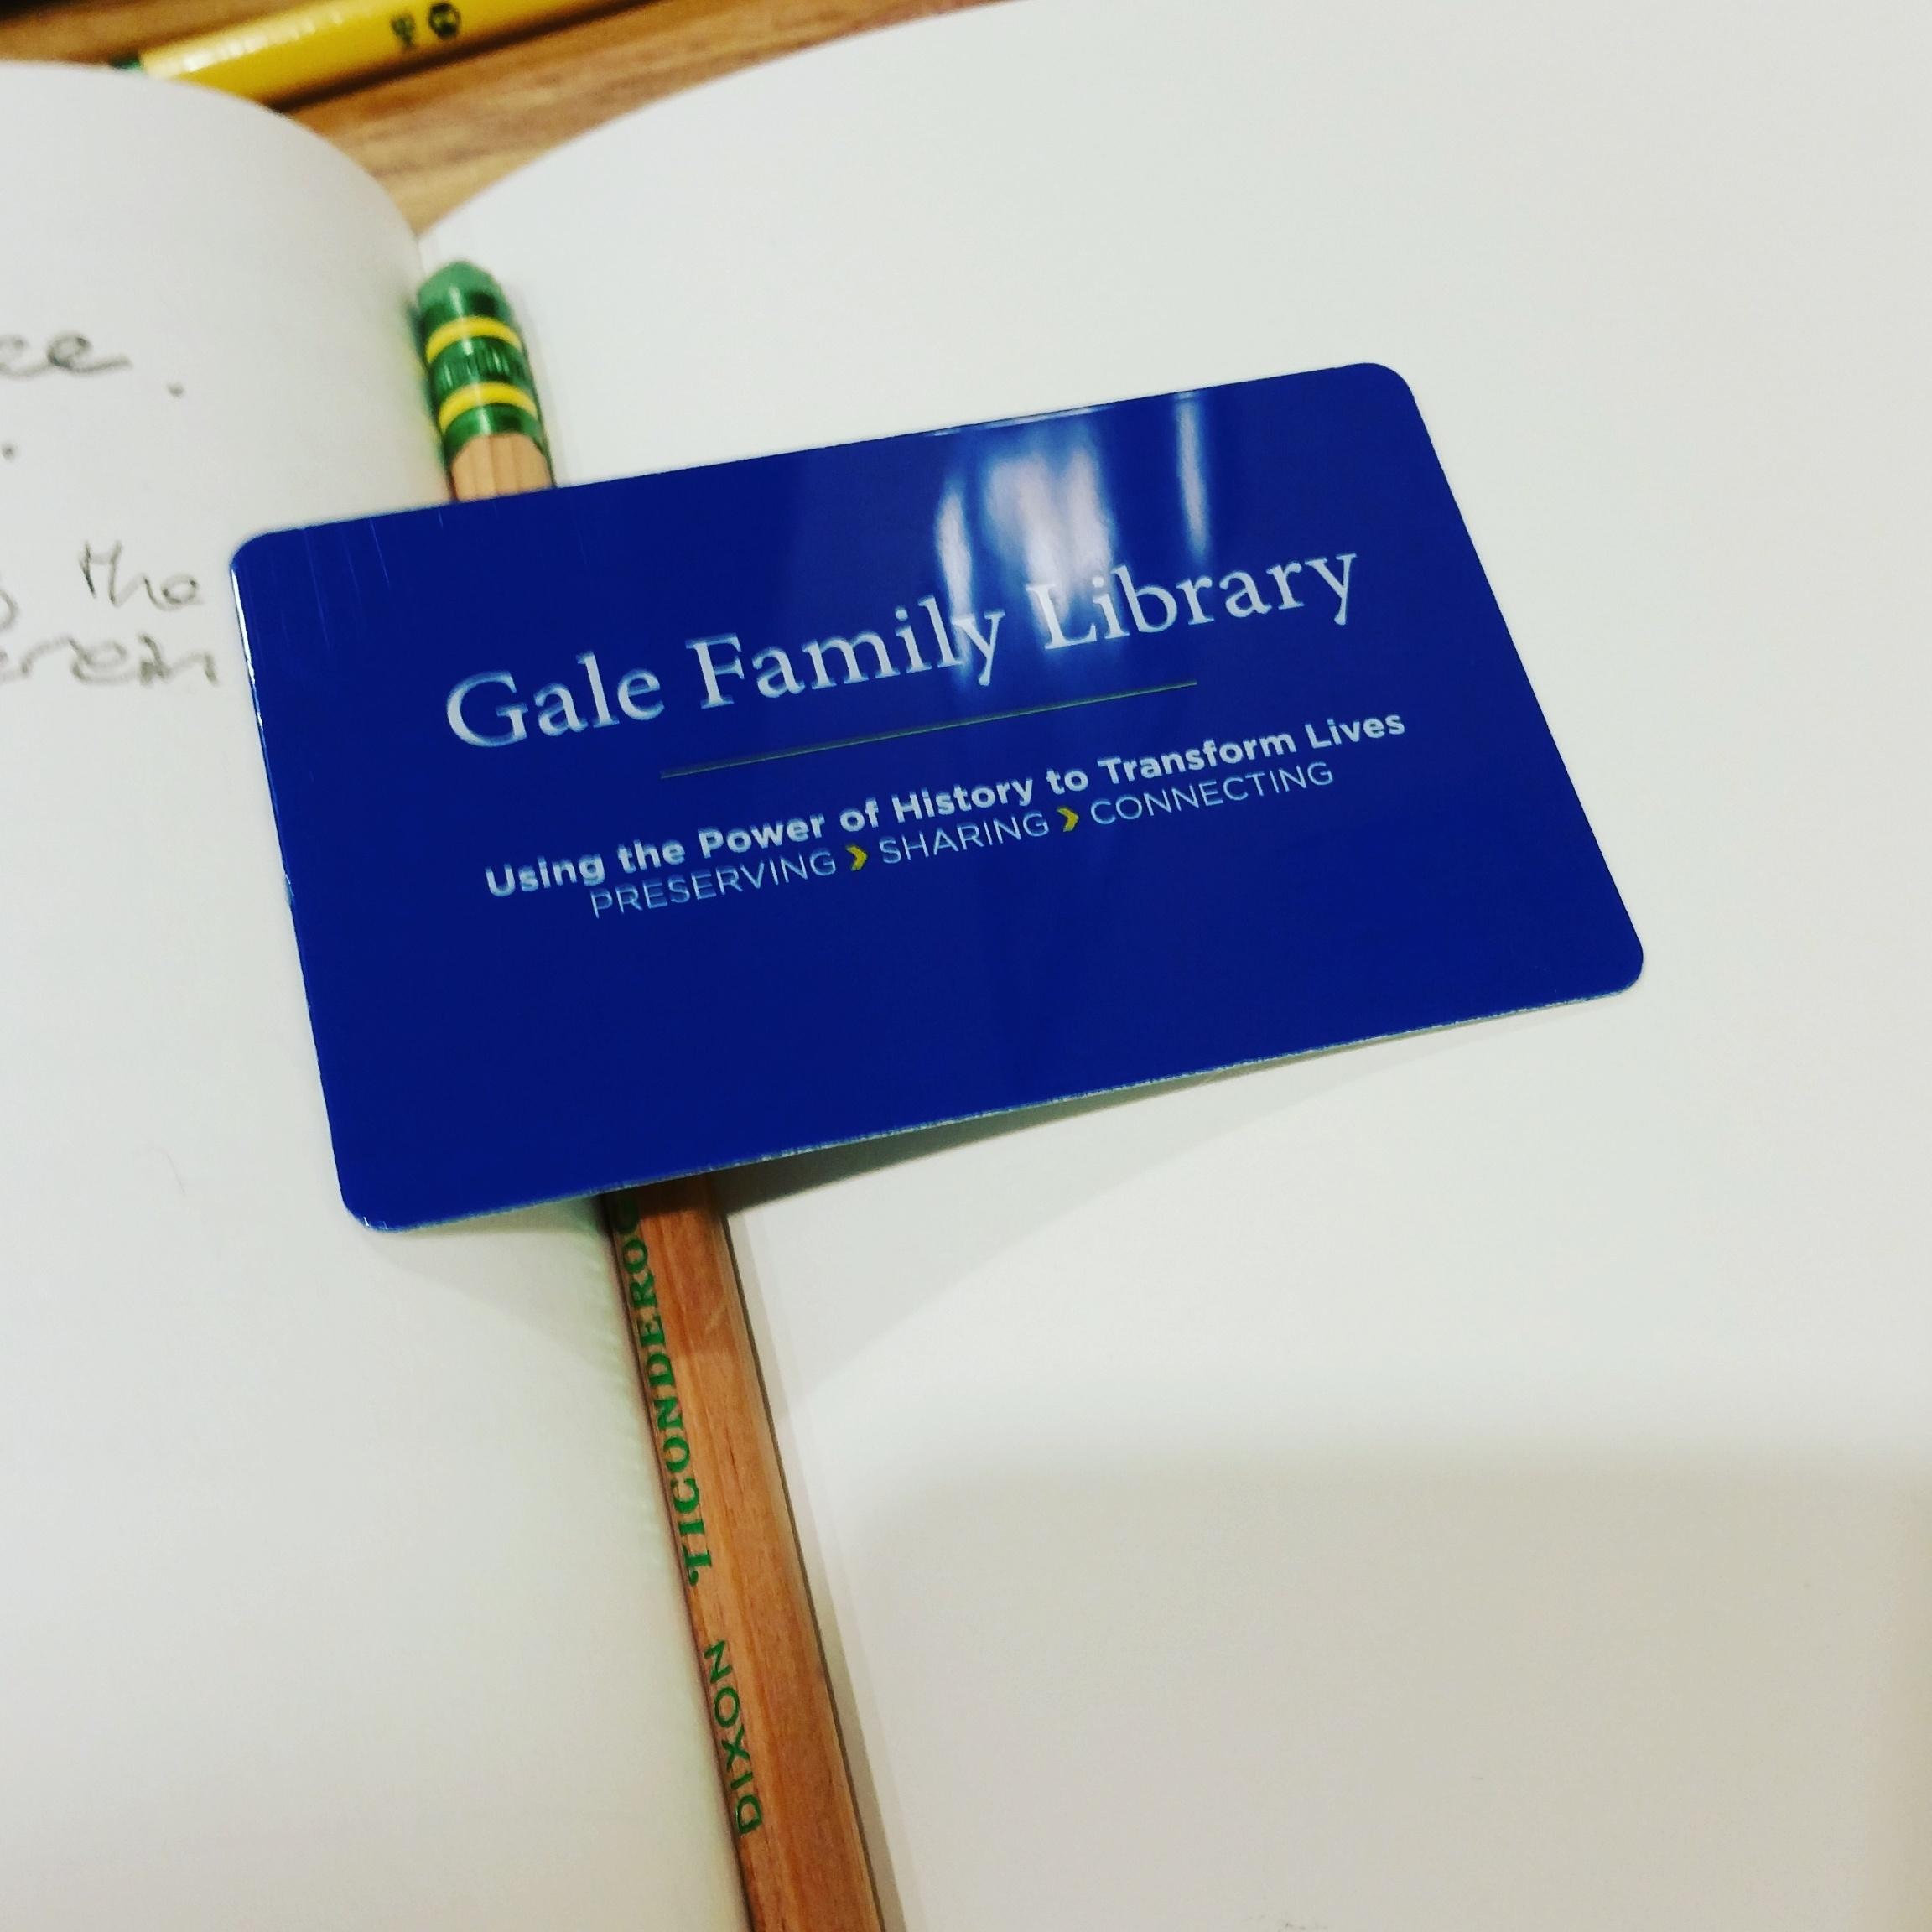 Got myself a new library card